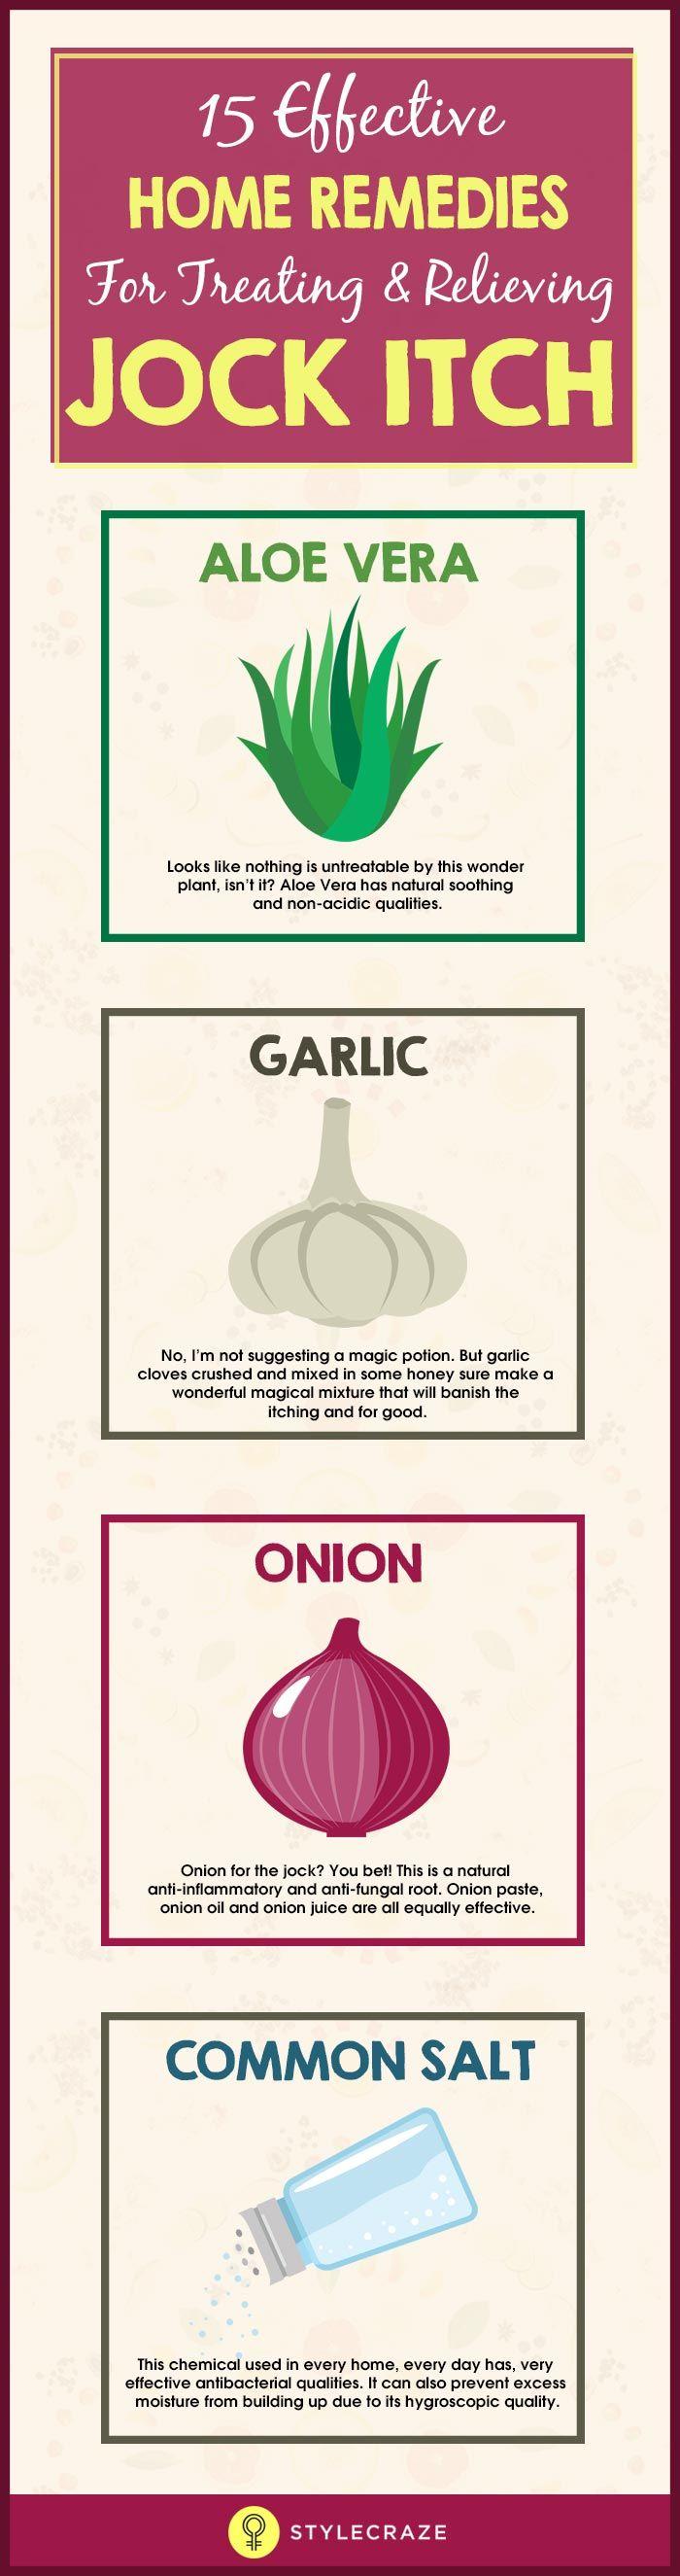 Smelly Groin | Groin Body Odor, Home Remedies for Groin Area Body Odor